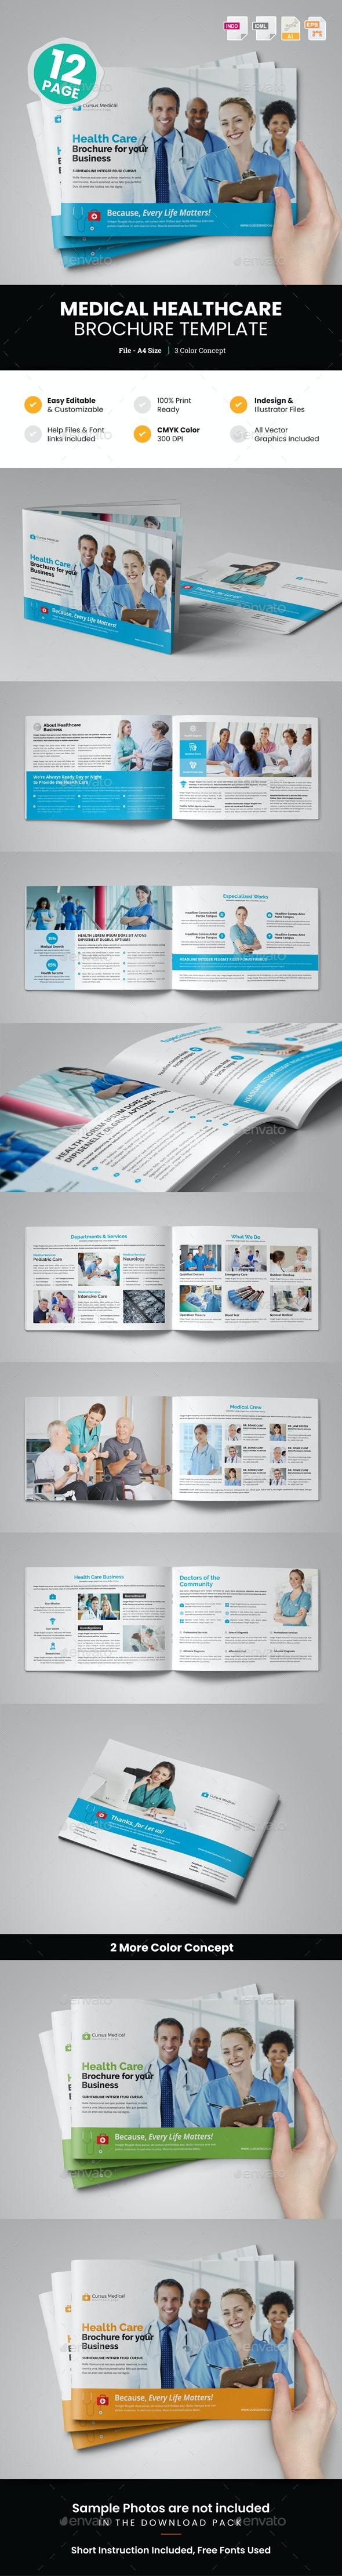 Medical HealthCare Brochure v3 - Corporate Brochures